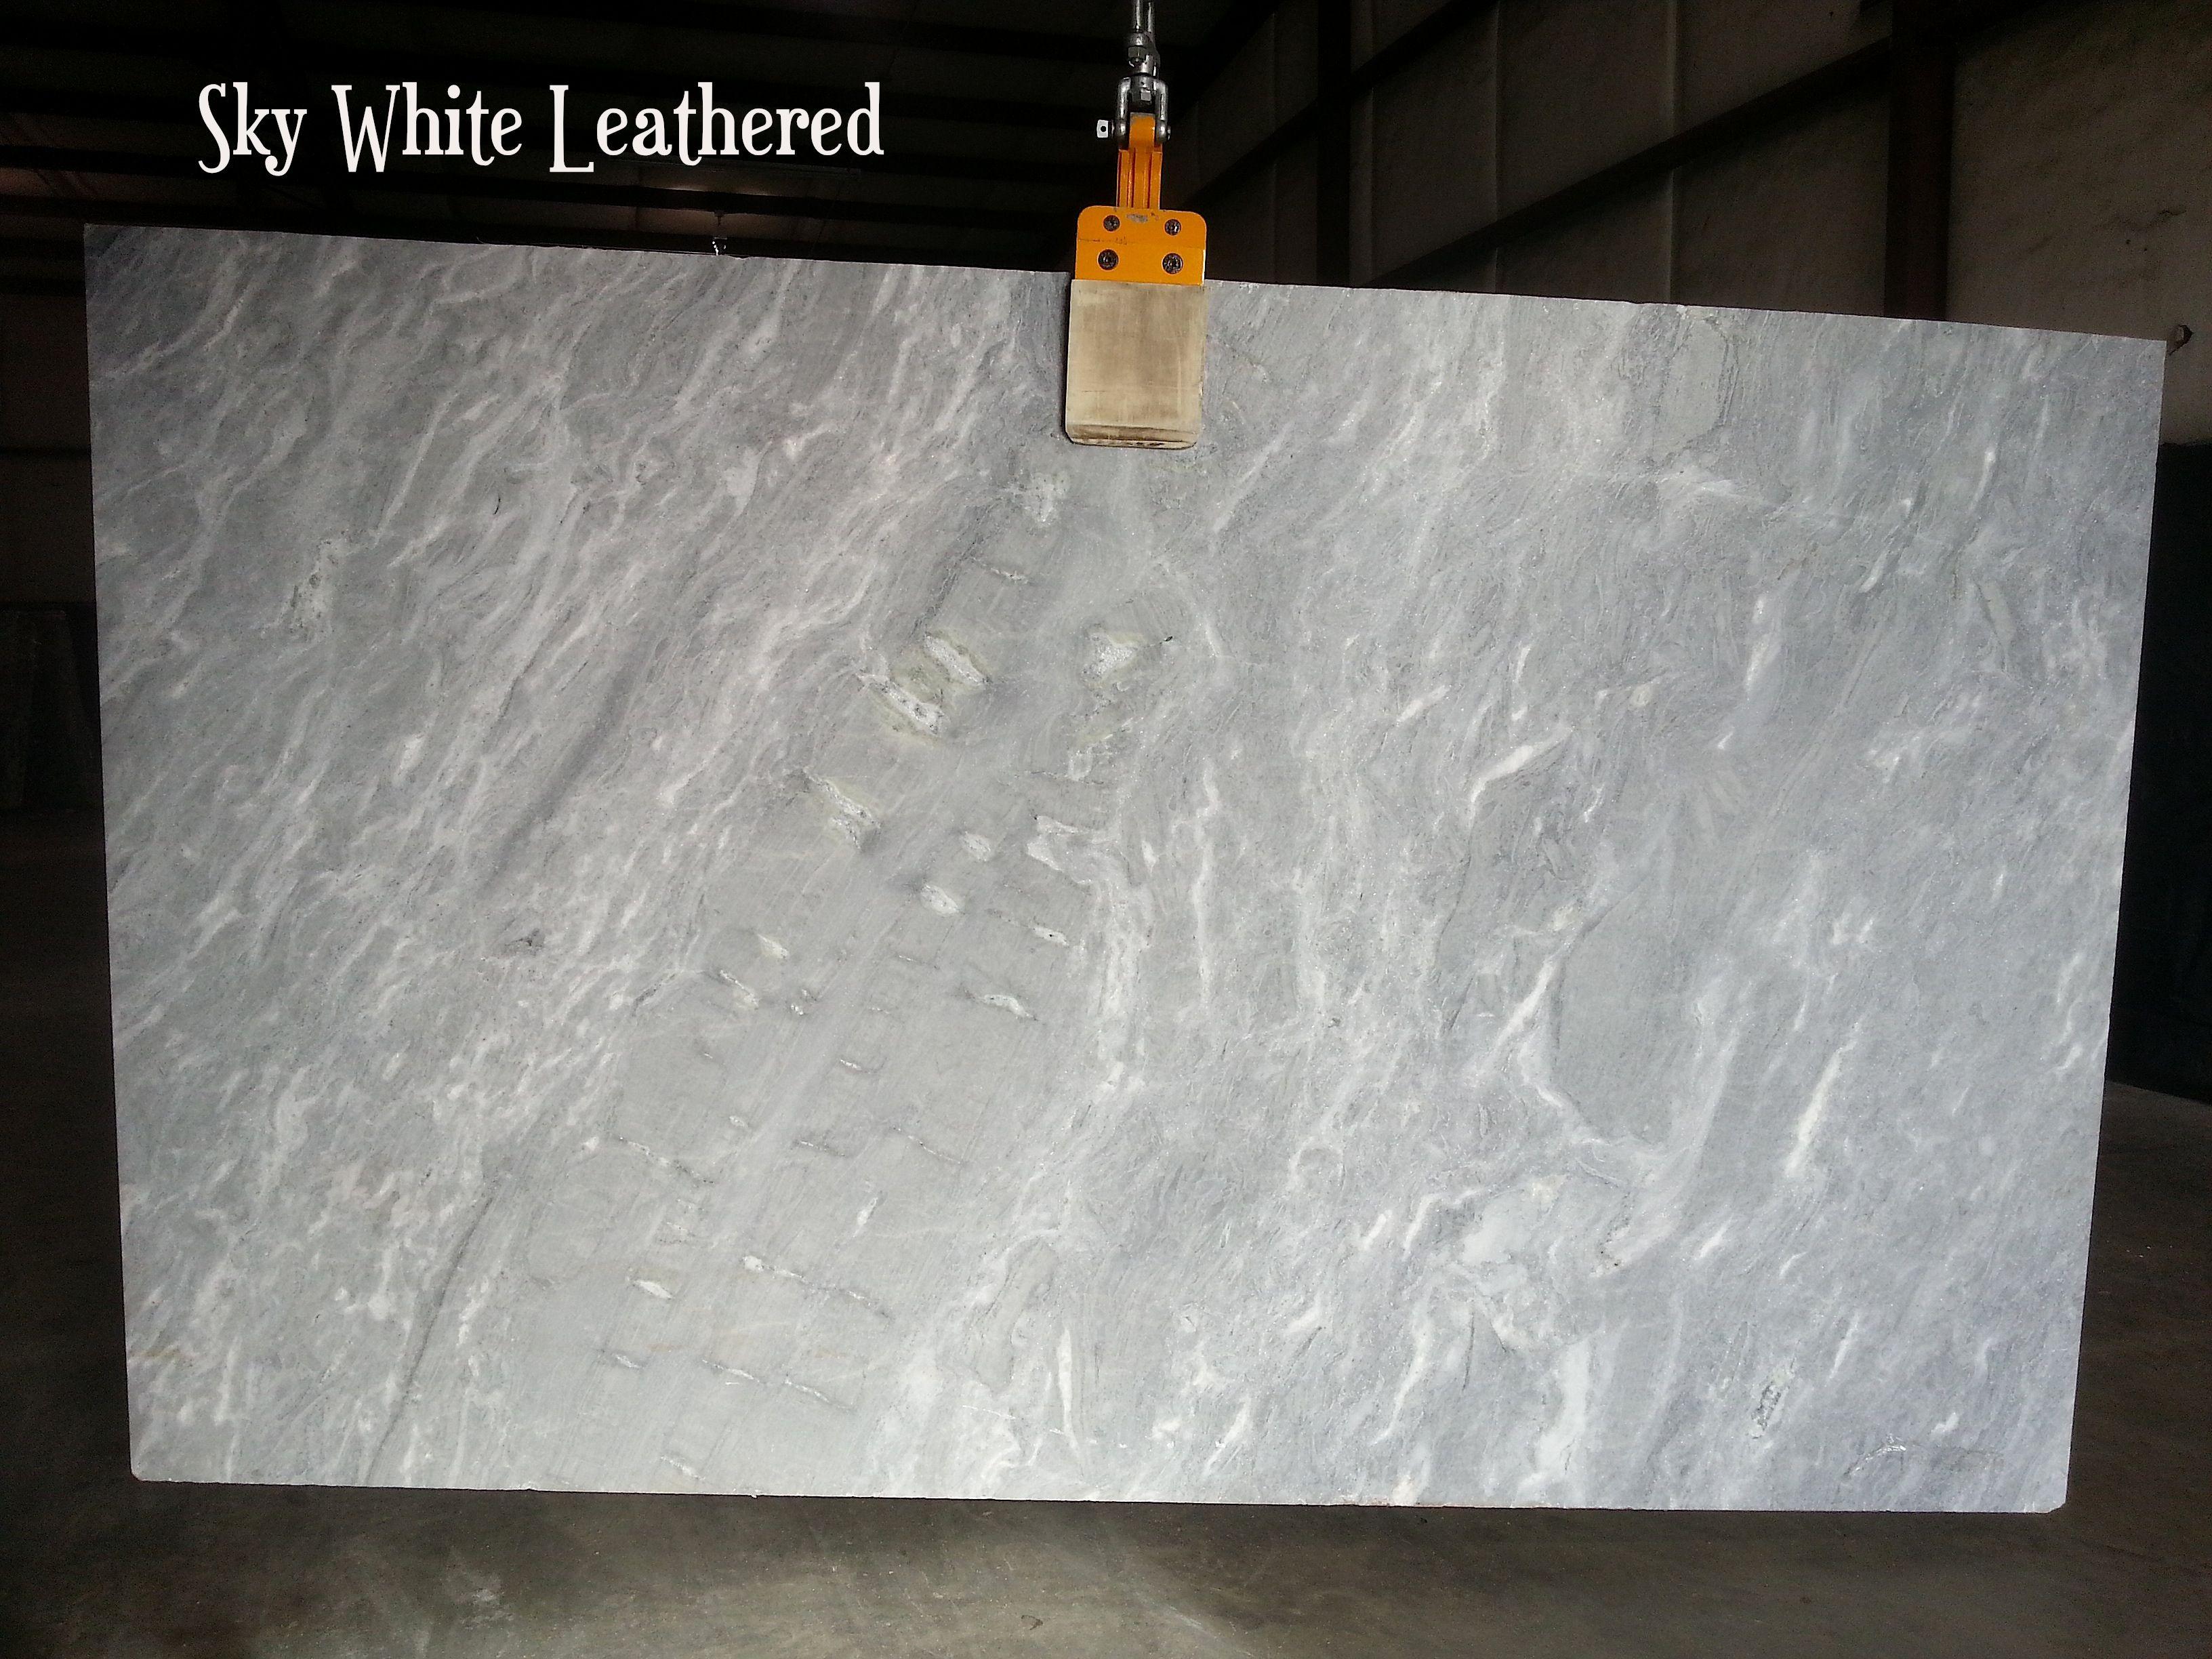 Sky White Quartzite With A Leathered Finish White Quartzite Stone Slab Design